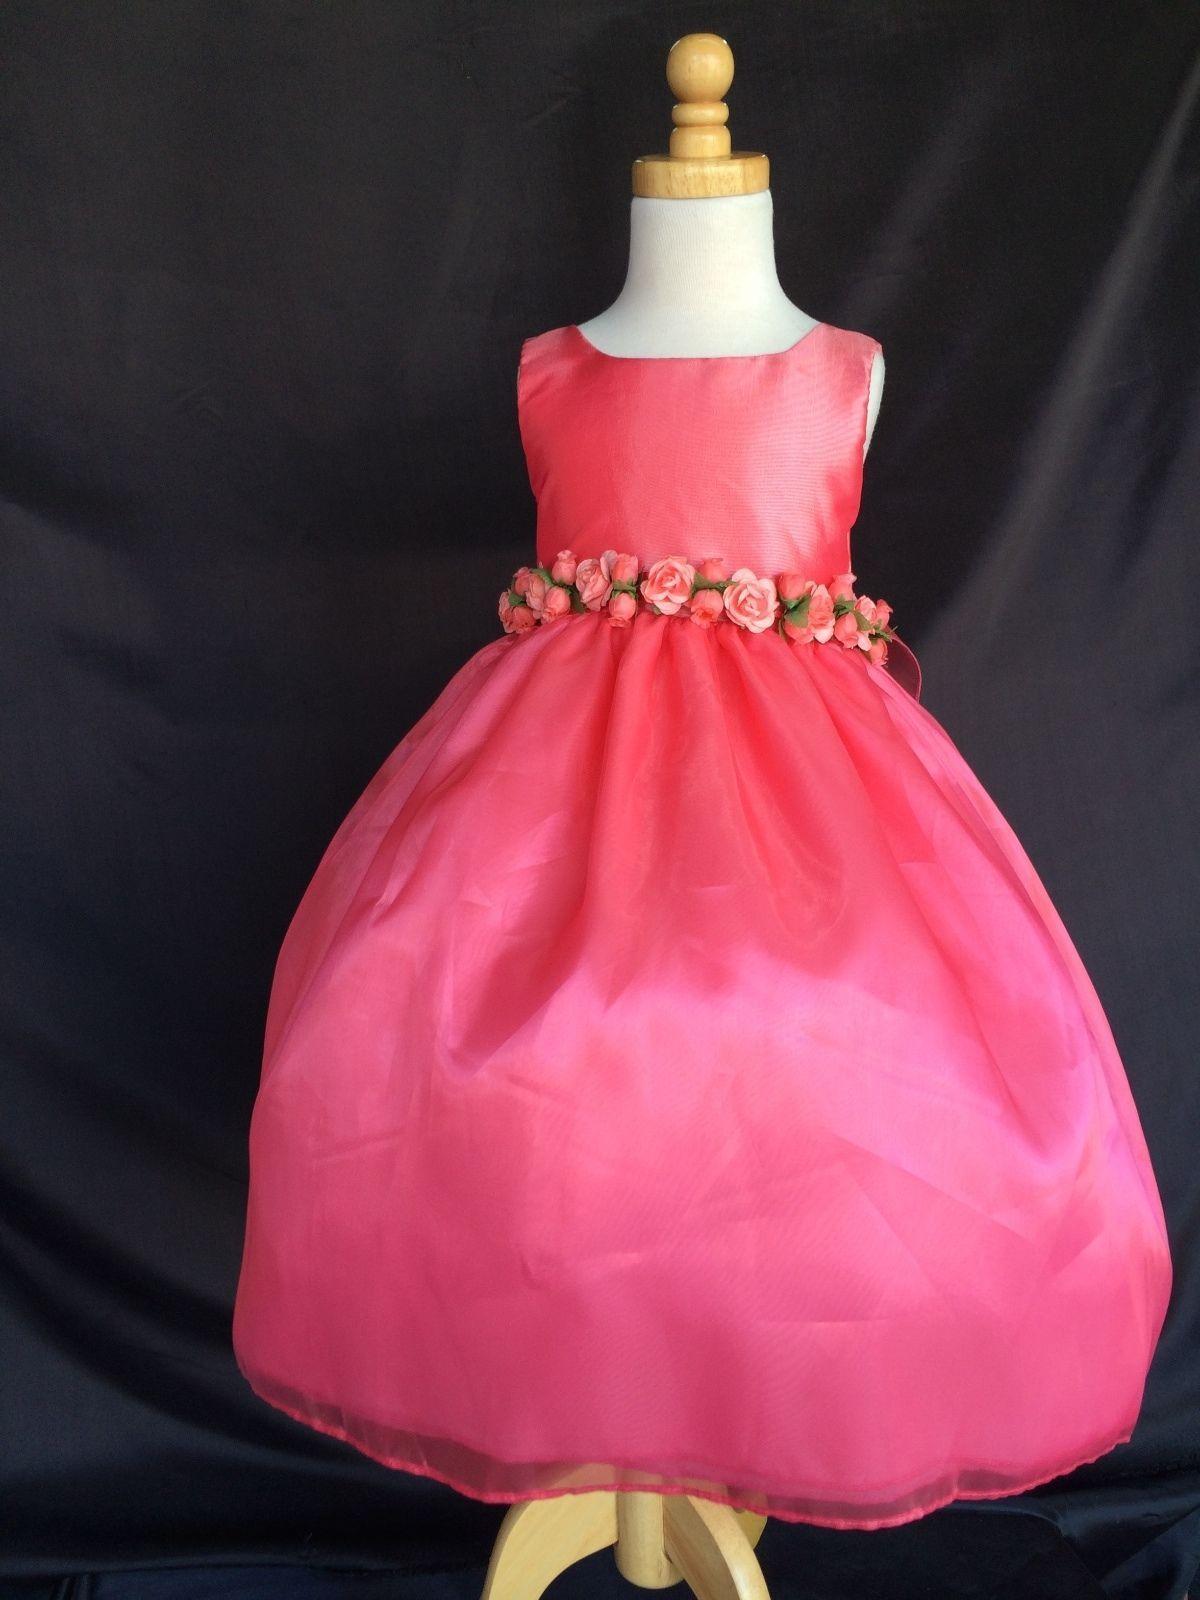 Coral 803 Flower Girl Bridesmaids Elegant Summer Toddler Girl Dress #35